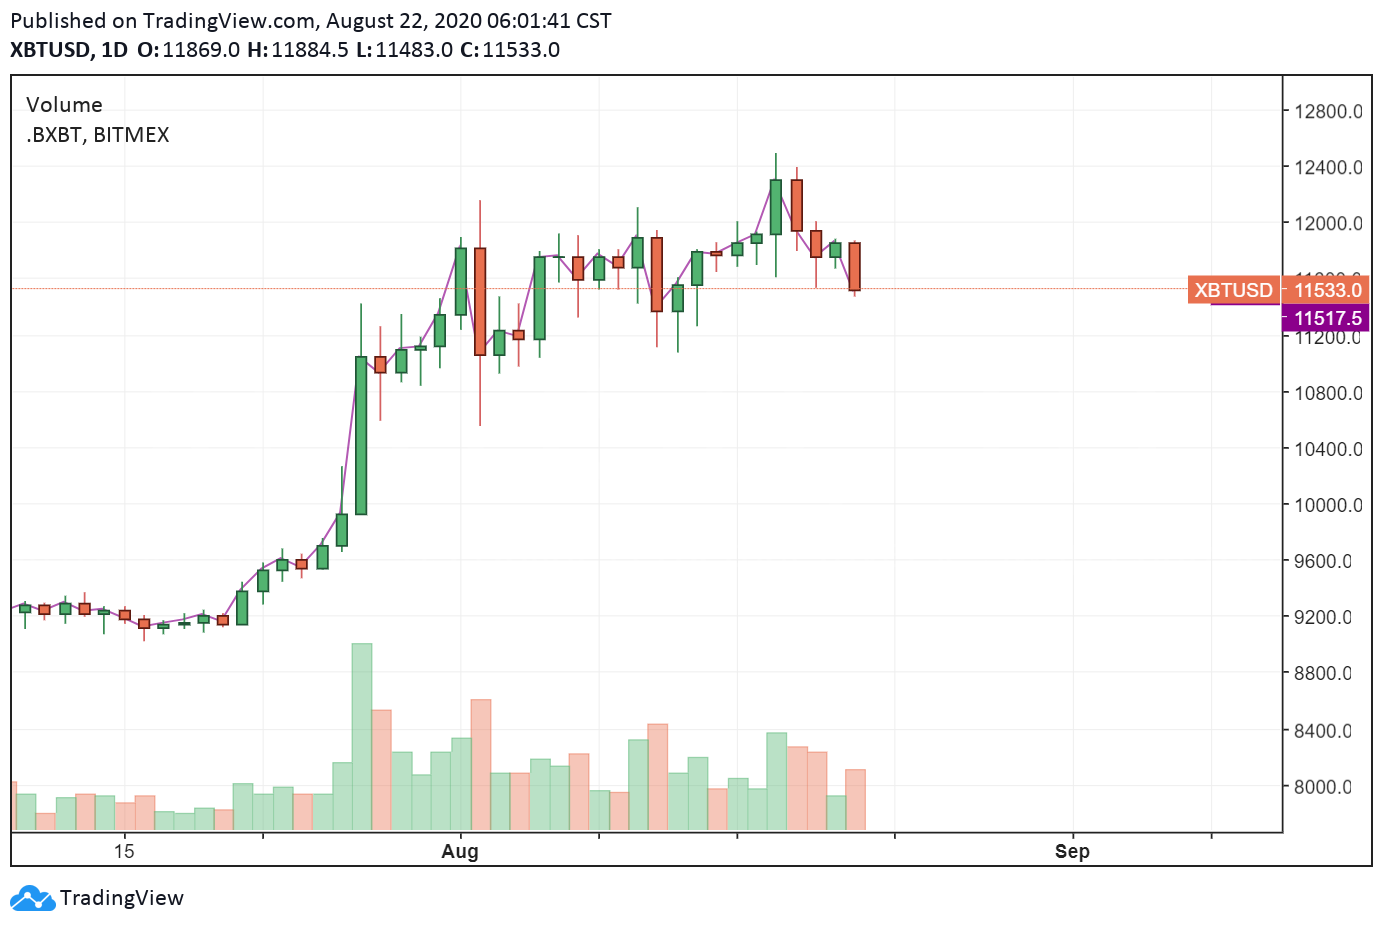 Analysts Fear a Strong US Dollar Will Dampen Bitcoin's Bullish Momentum